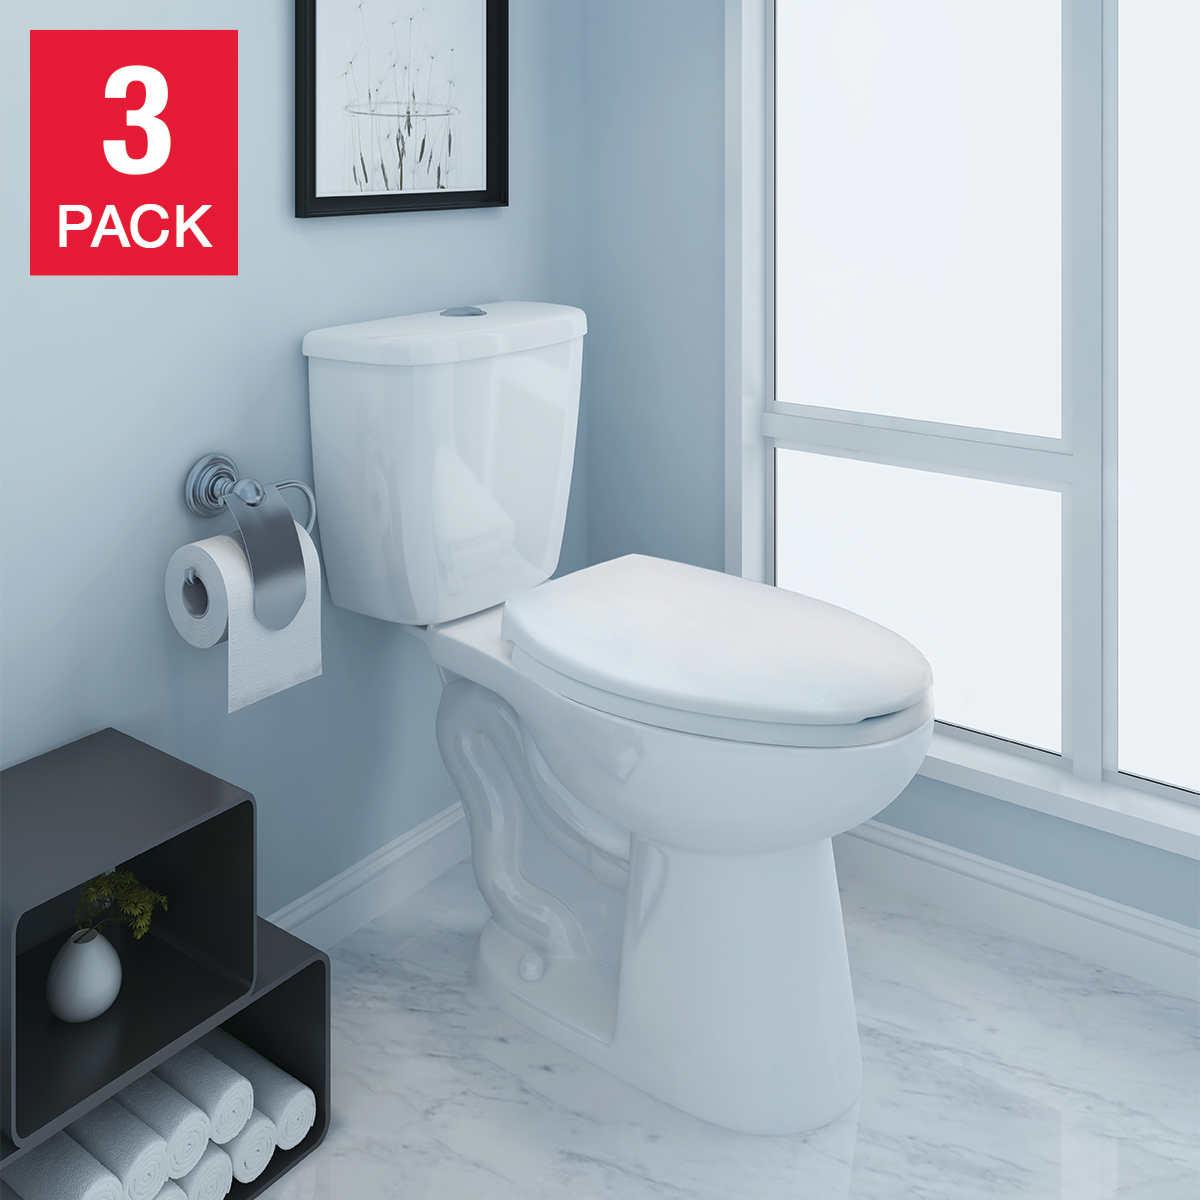 WaterRidge Two-piece Toilet, 12-pack